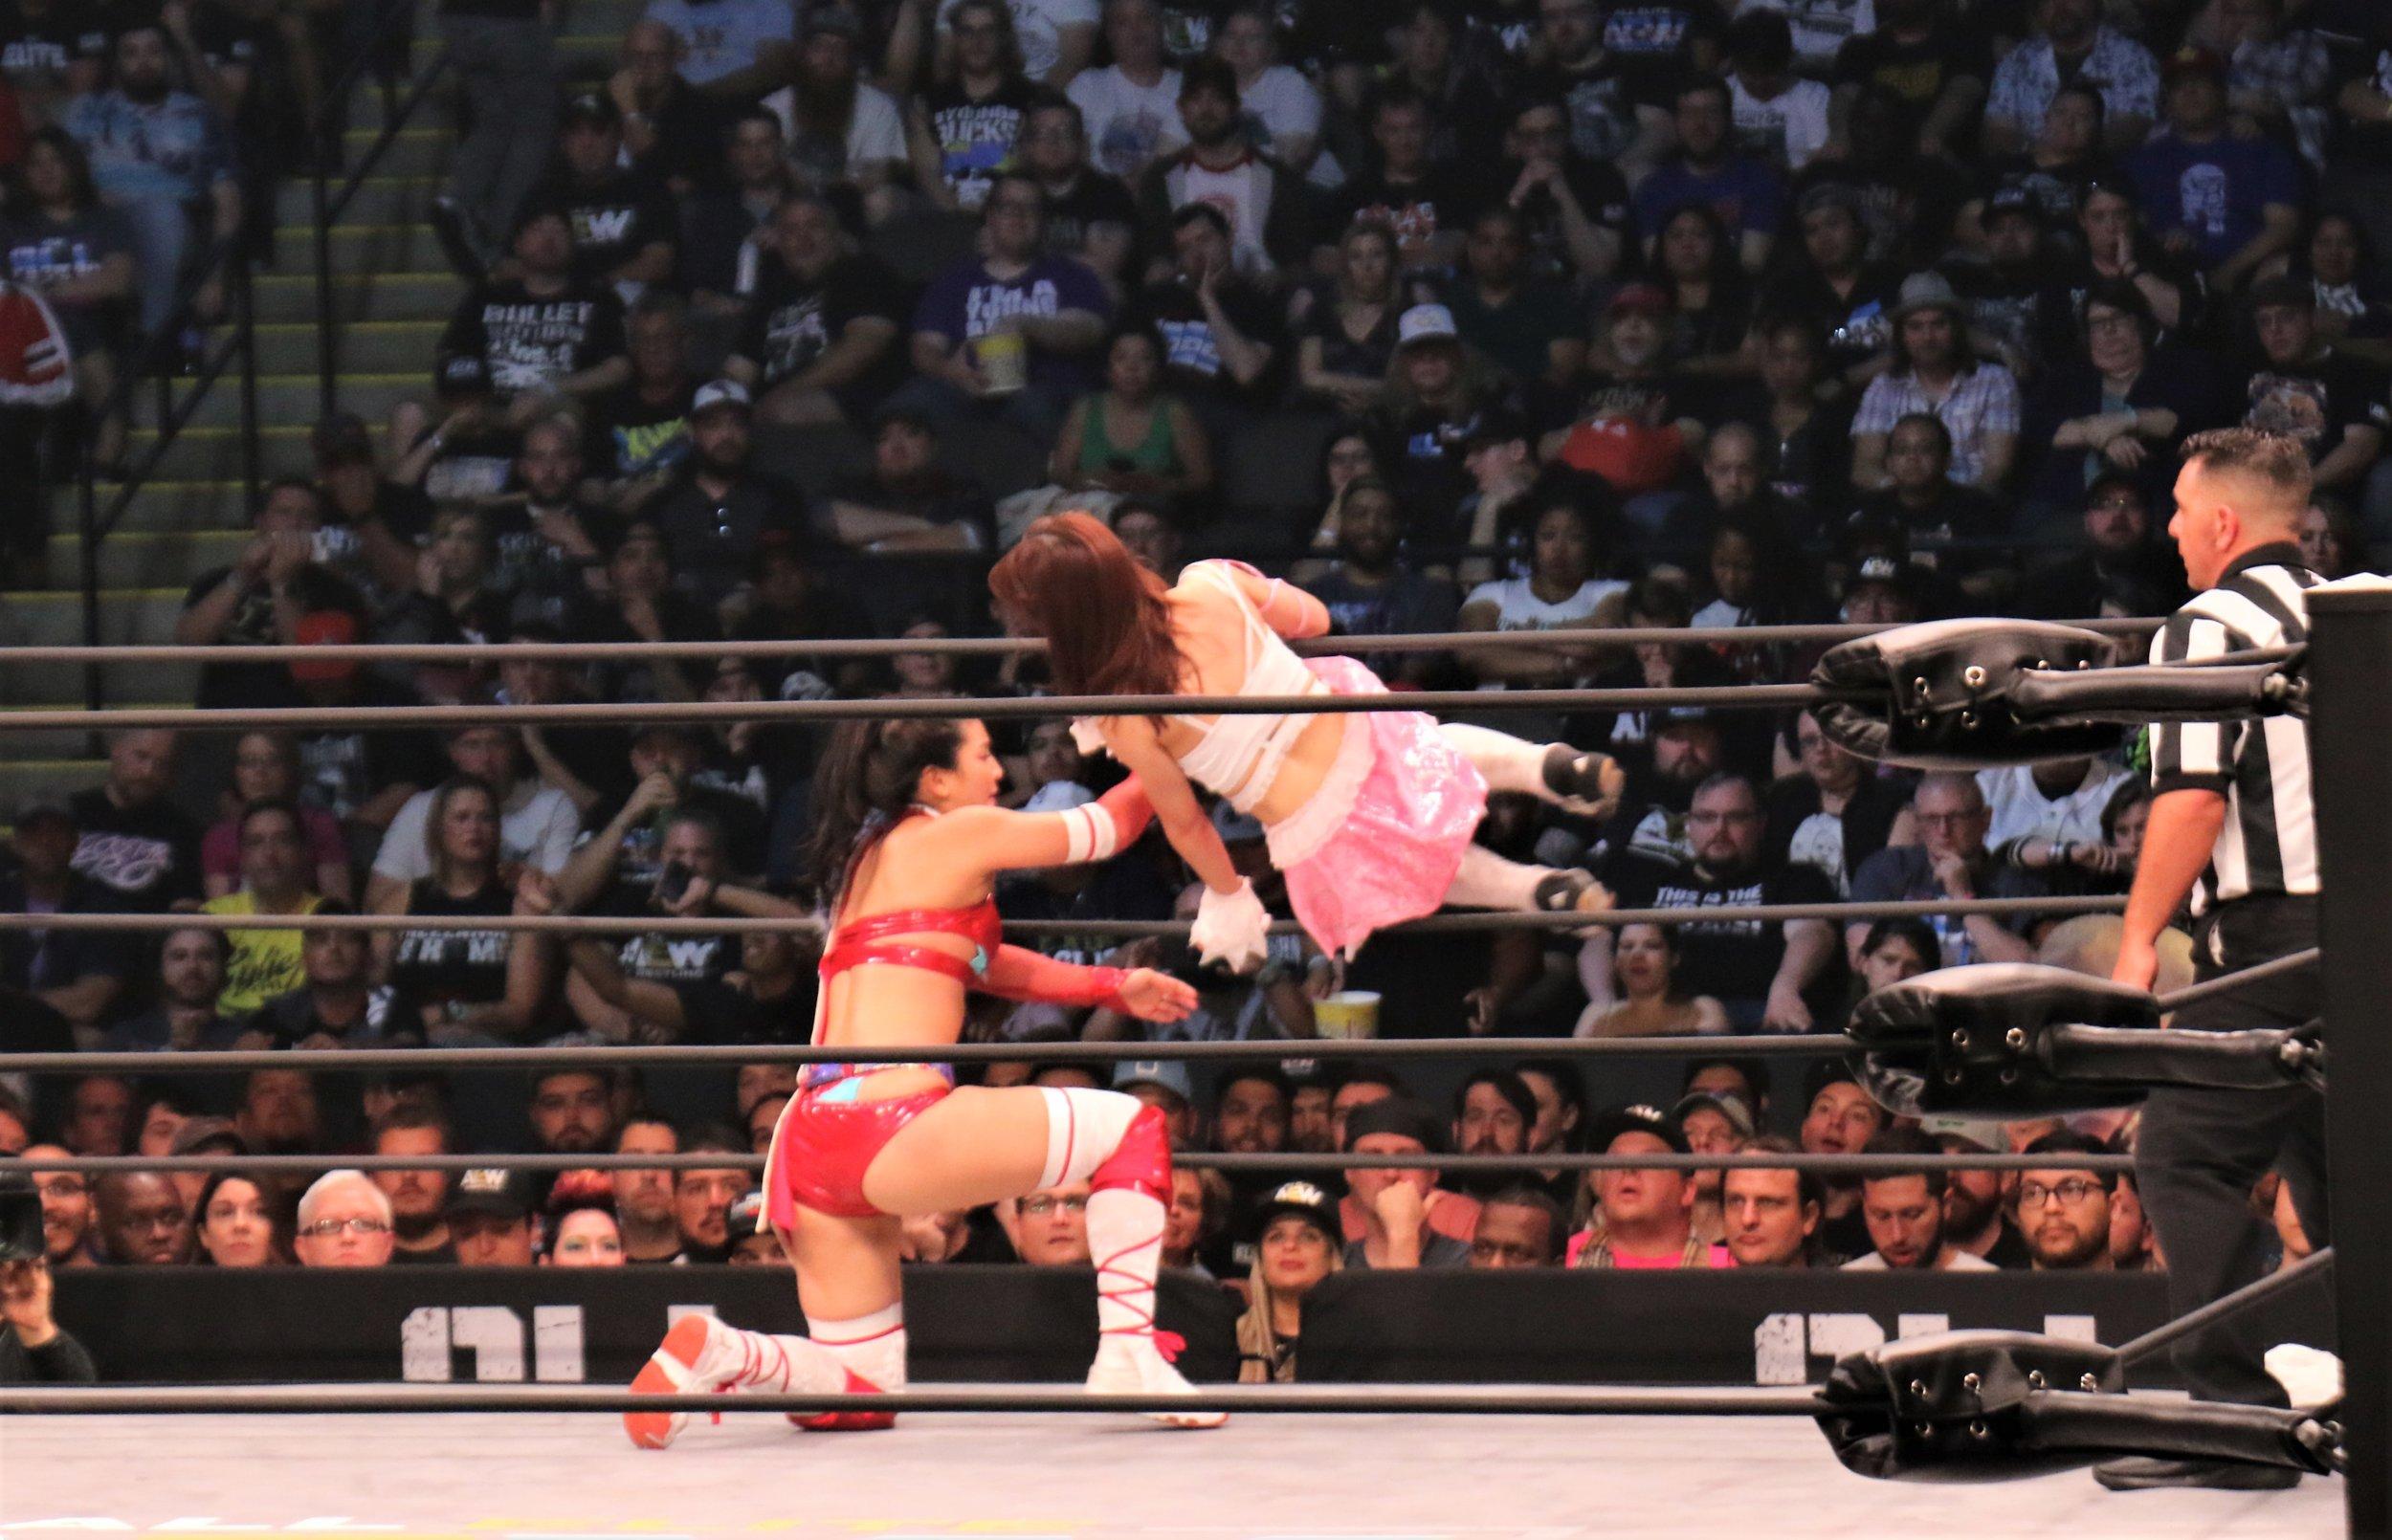 Riho hits the 619 on Hikaru Shida.